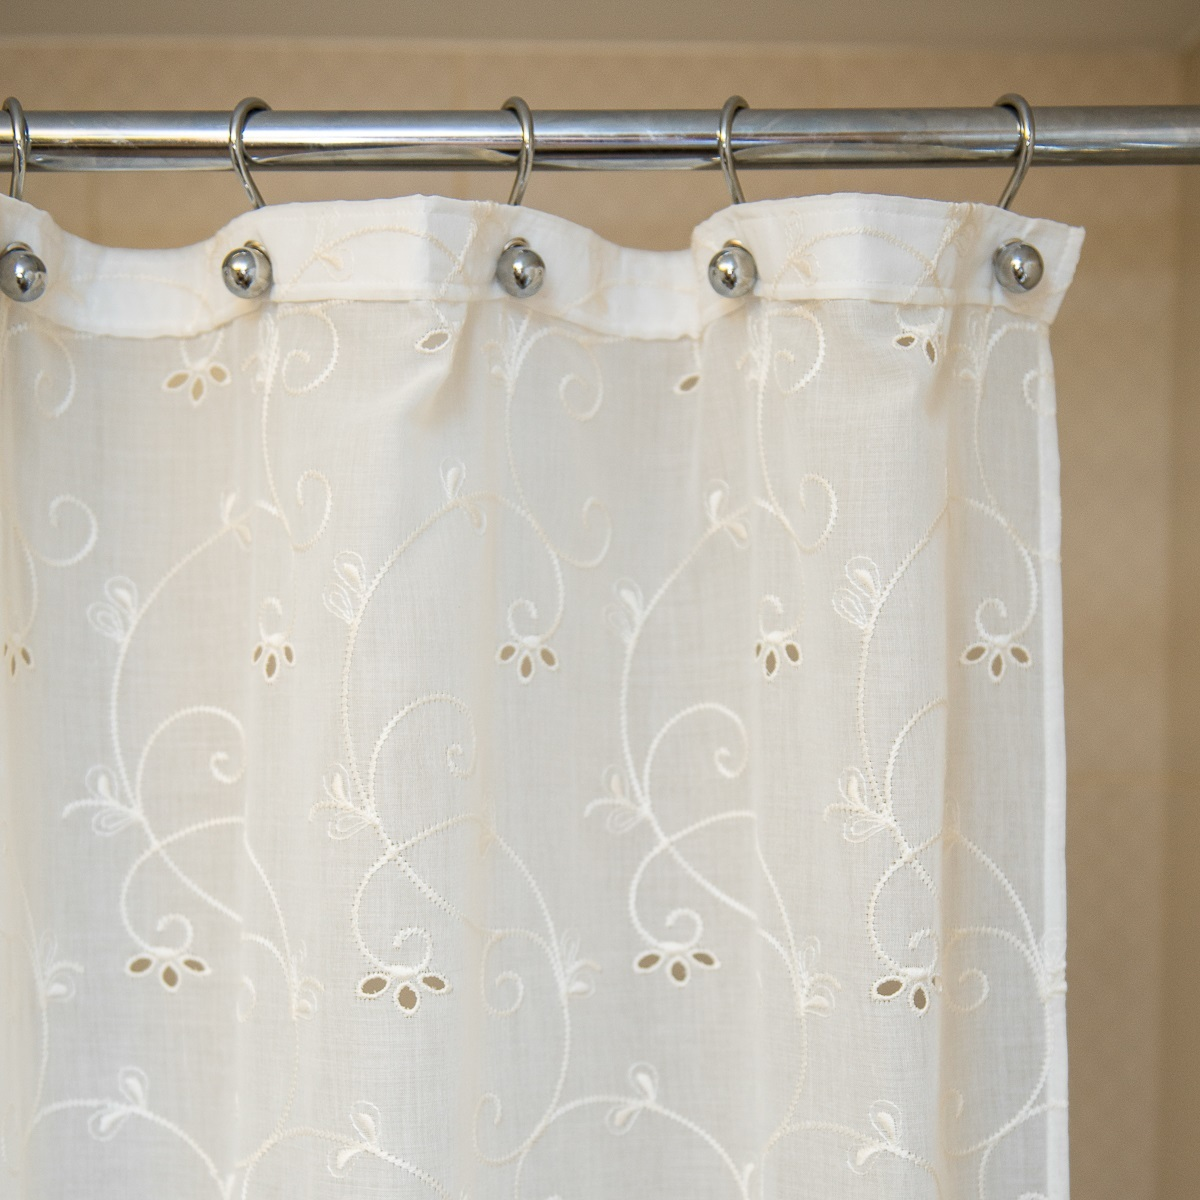 Шторки Шторка для ванной 200х240 Arti-Deco Embroidery 2803 elitnaya-shtorka-dlya-vannoy-200h240-embrodery-2803-ot-arti-deco-ispaniya.jpg